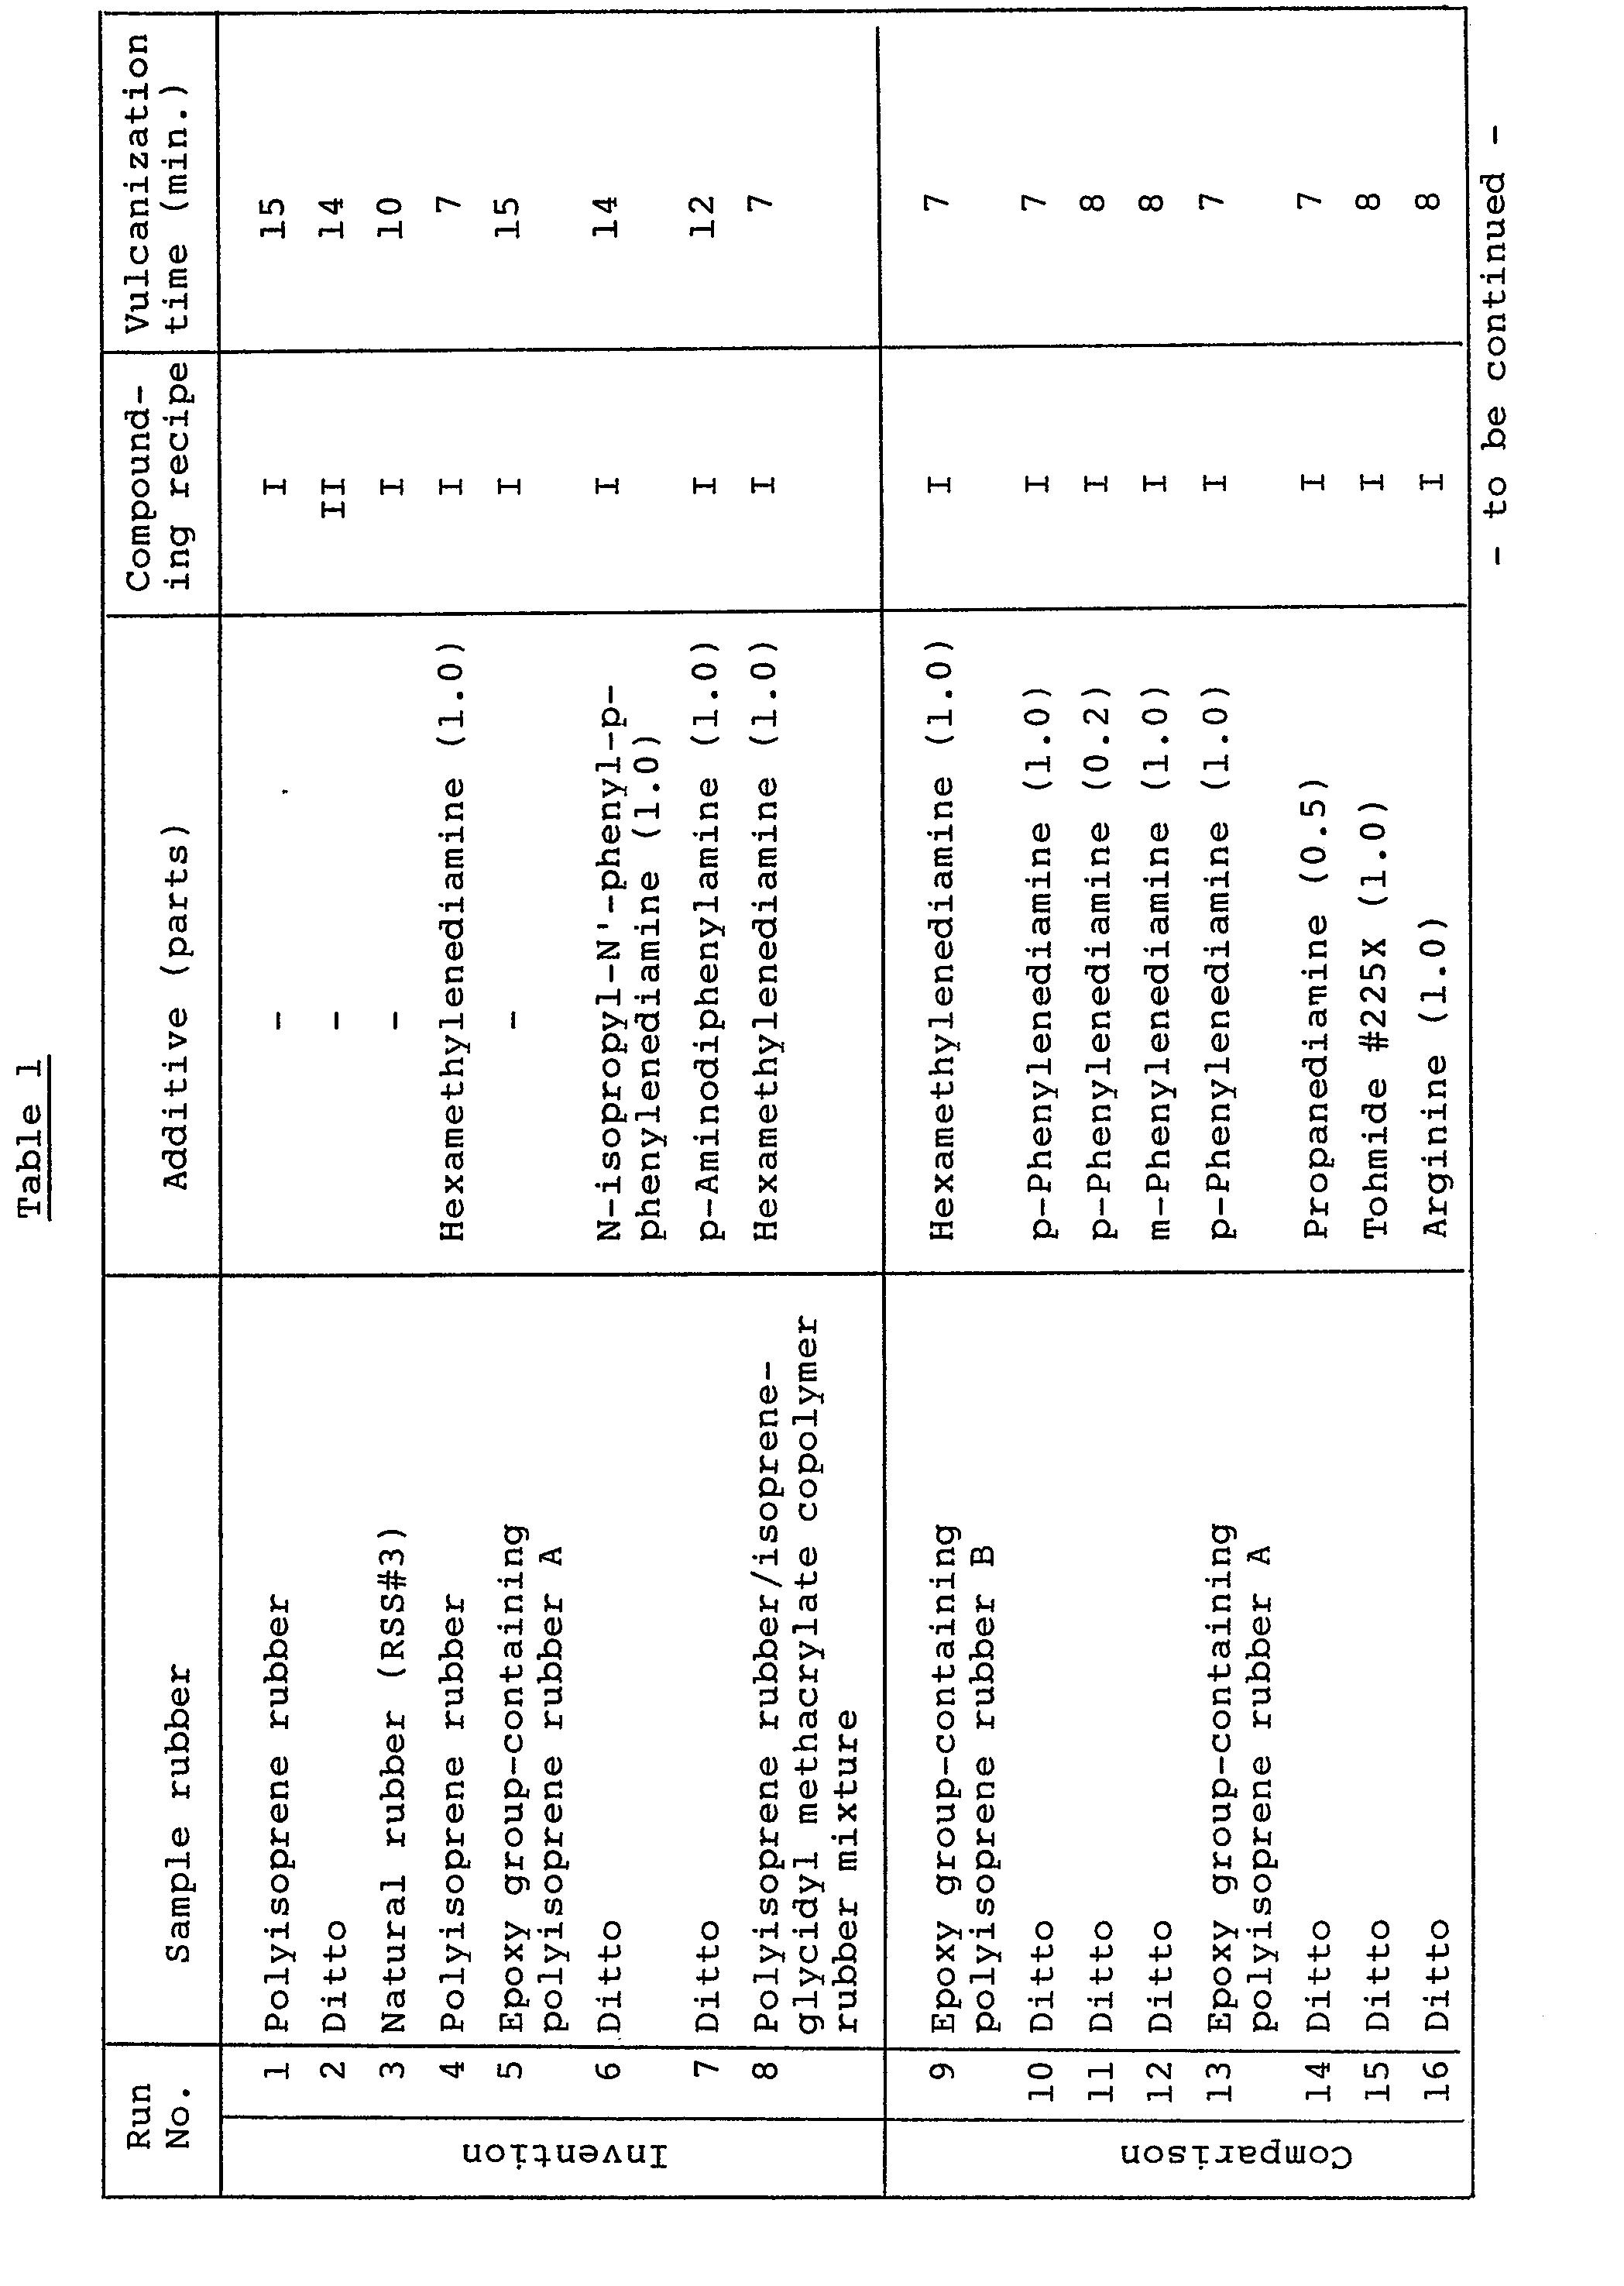 Cis-1,4-polyisoprene rubber composition - Patent 0068468